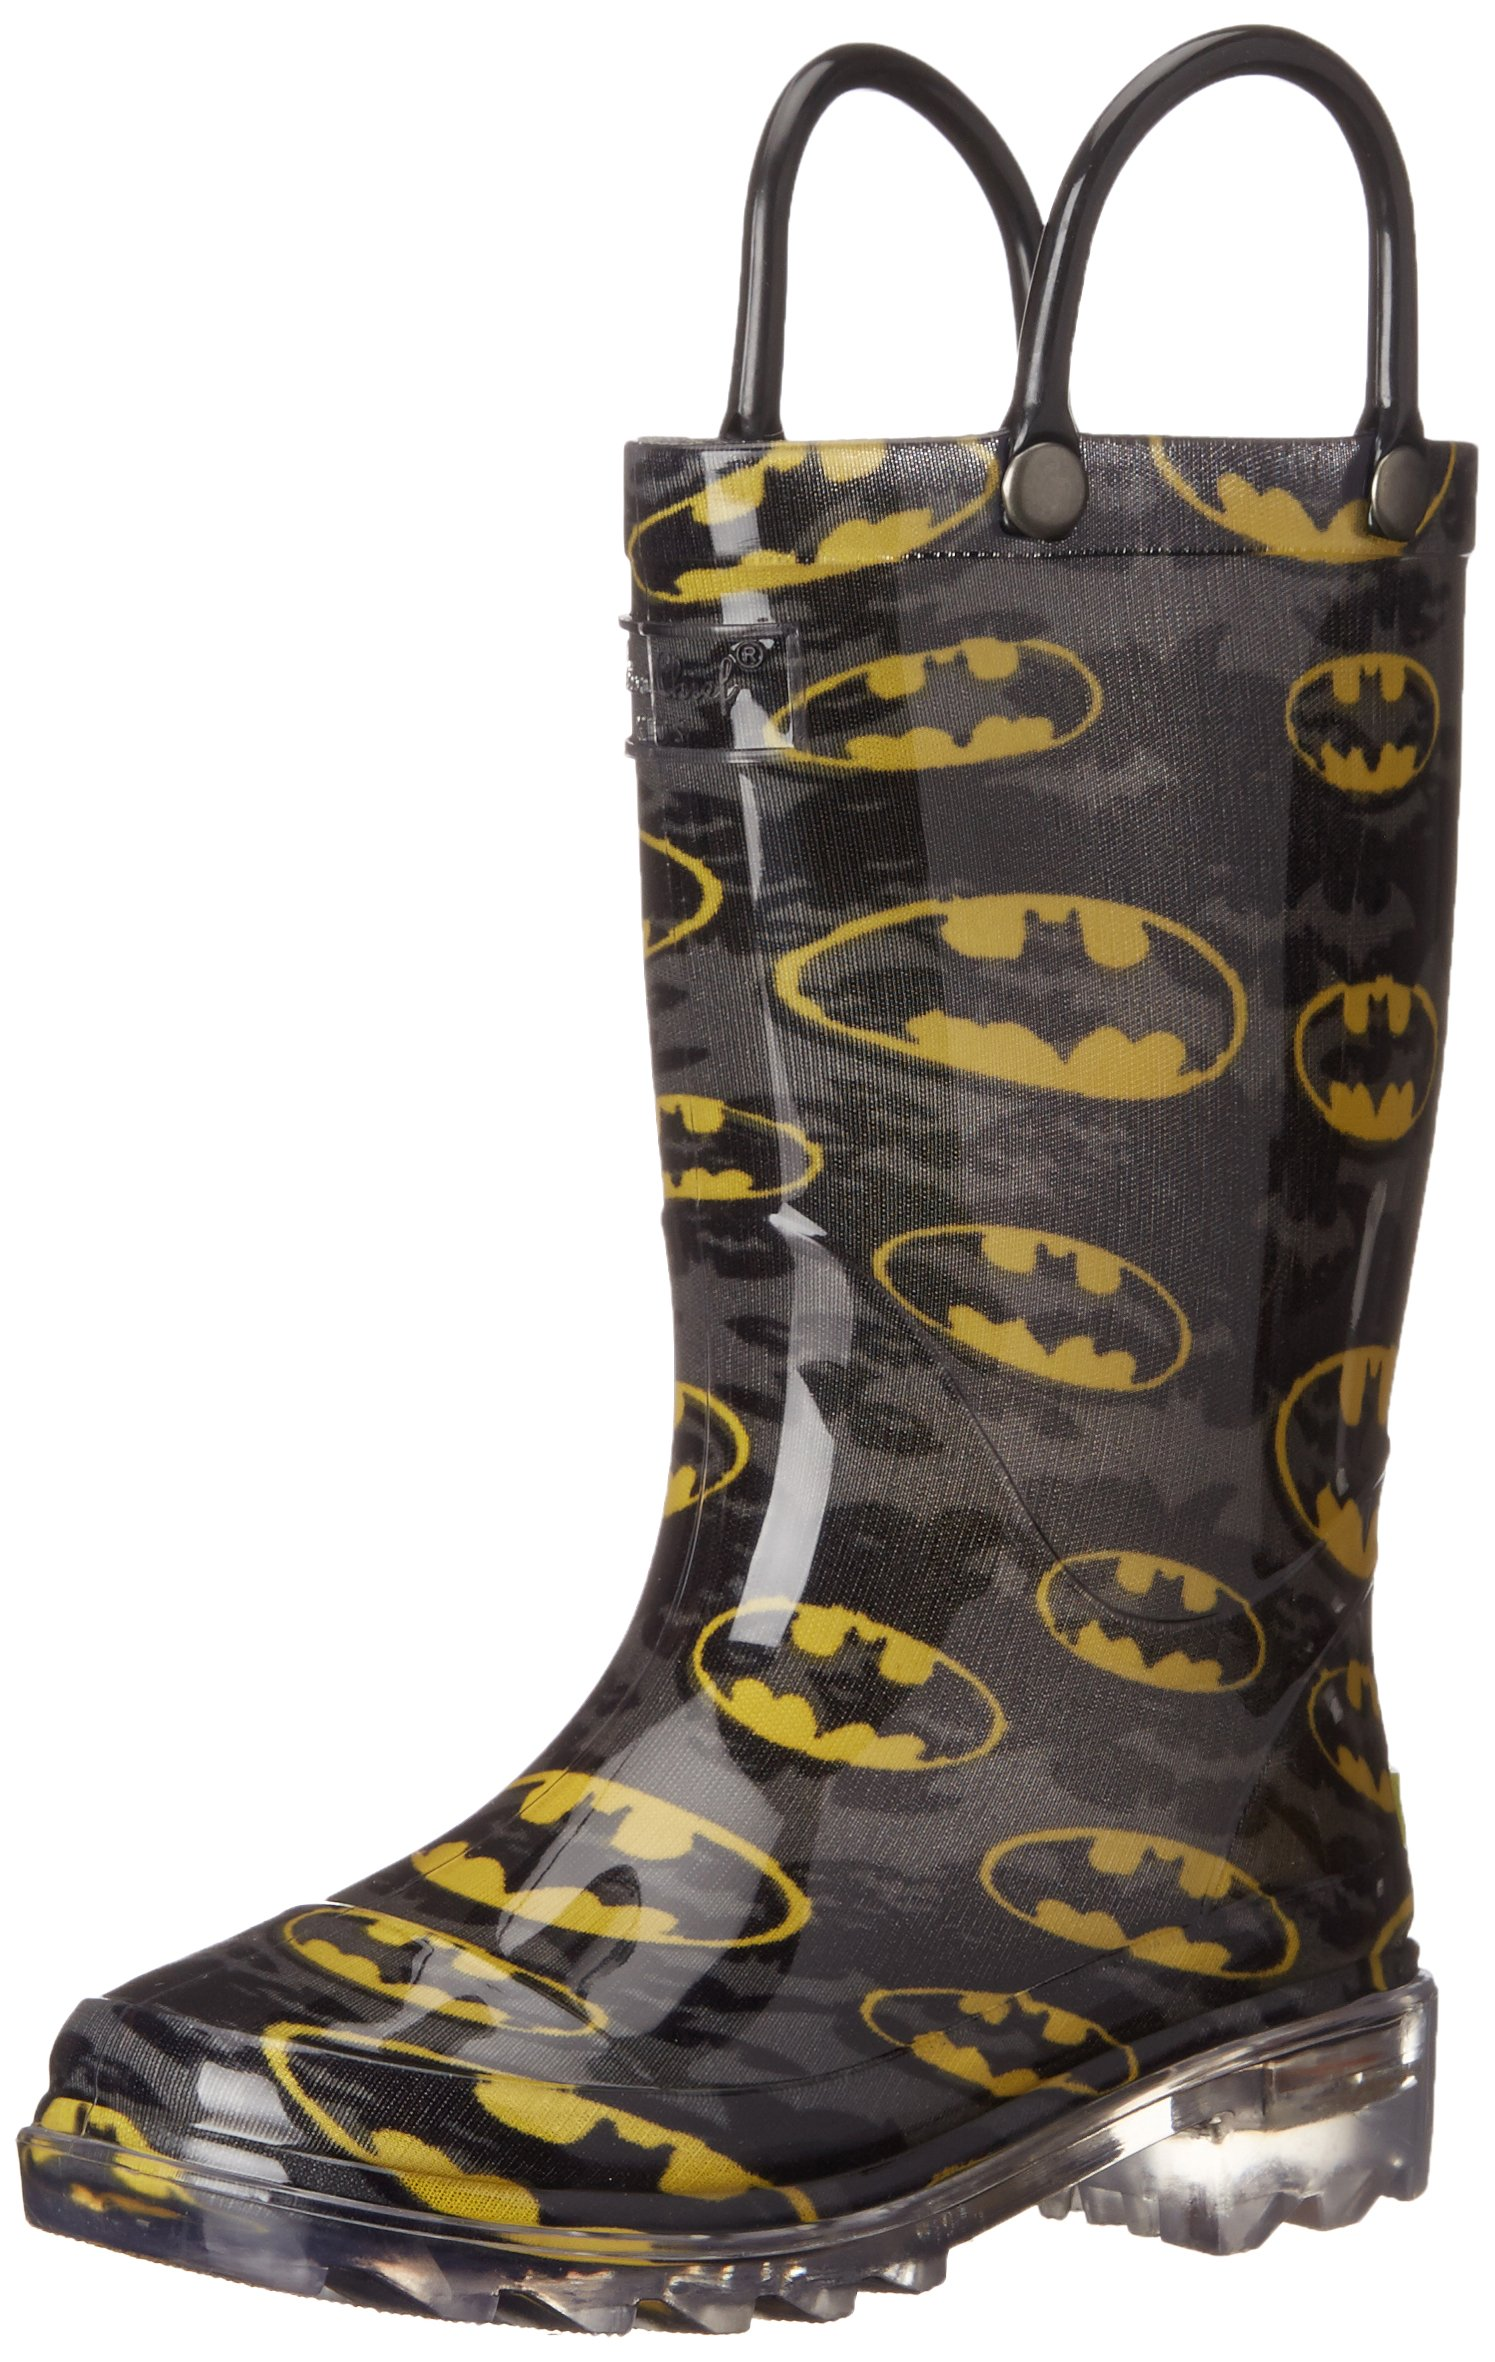 Western Chief Kids Waterproof D.C. Comics Character Rain Boots with Easy on Handles, Light-up Batman, 13 M US Little Kid